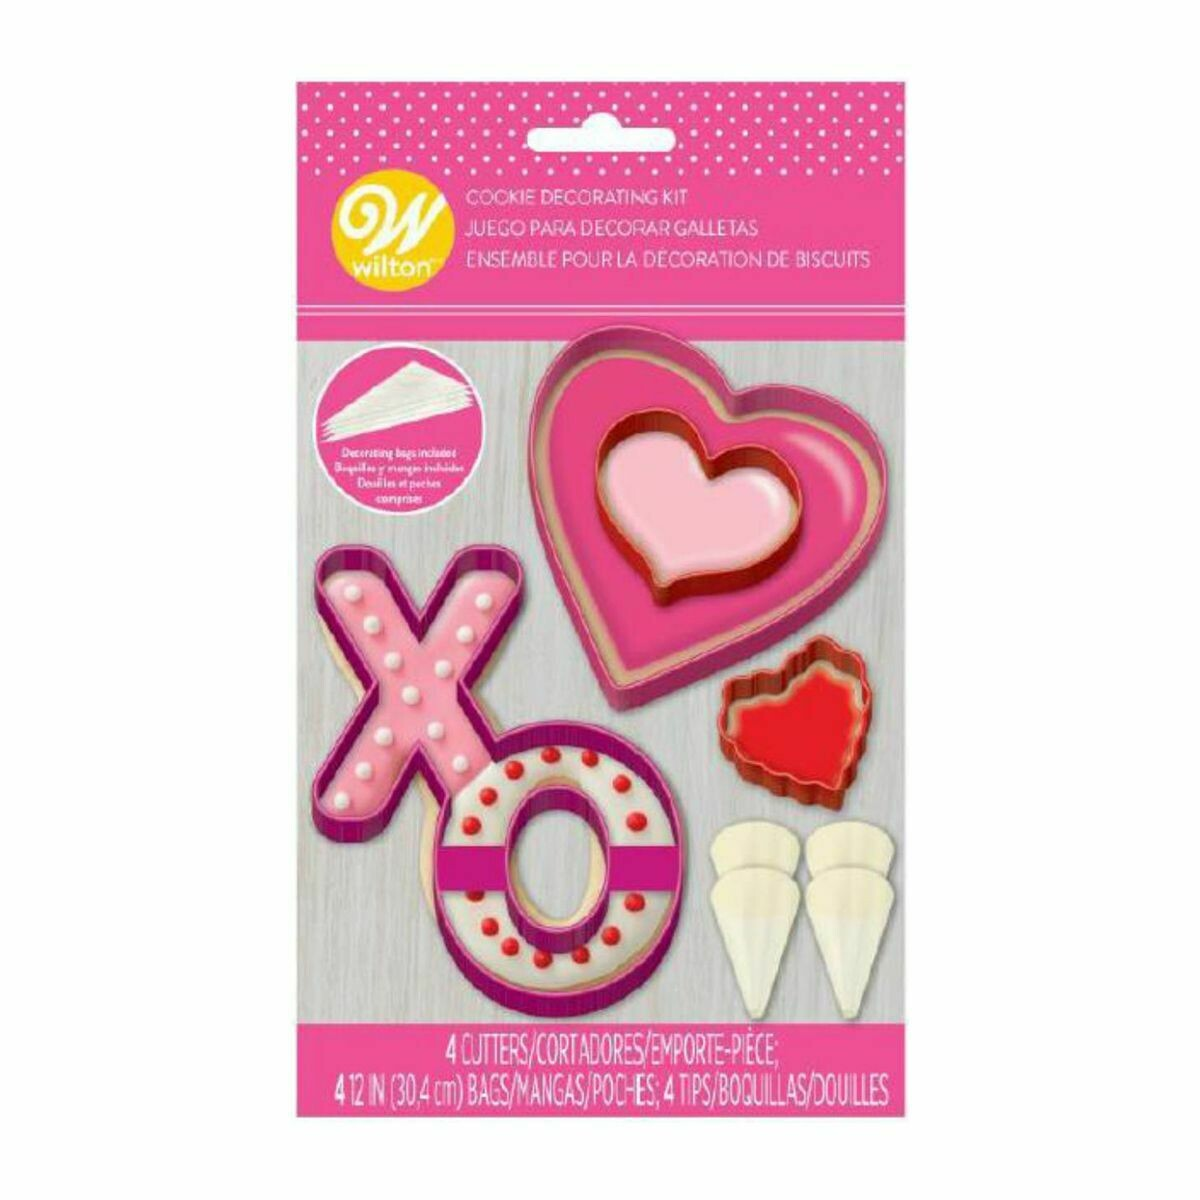 Wilton Valentine Cookie Decorating Kit - Σετ κατασκευής και διακόσμησης μπισκότων με θέμα την Αγάπη